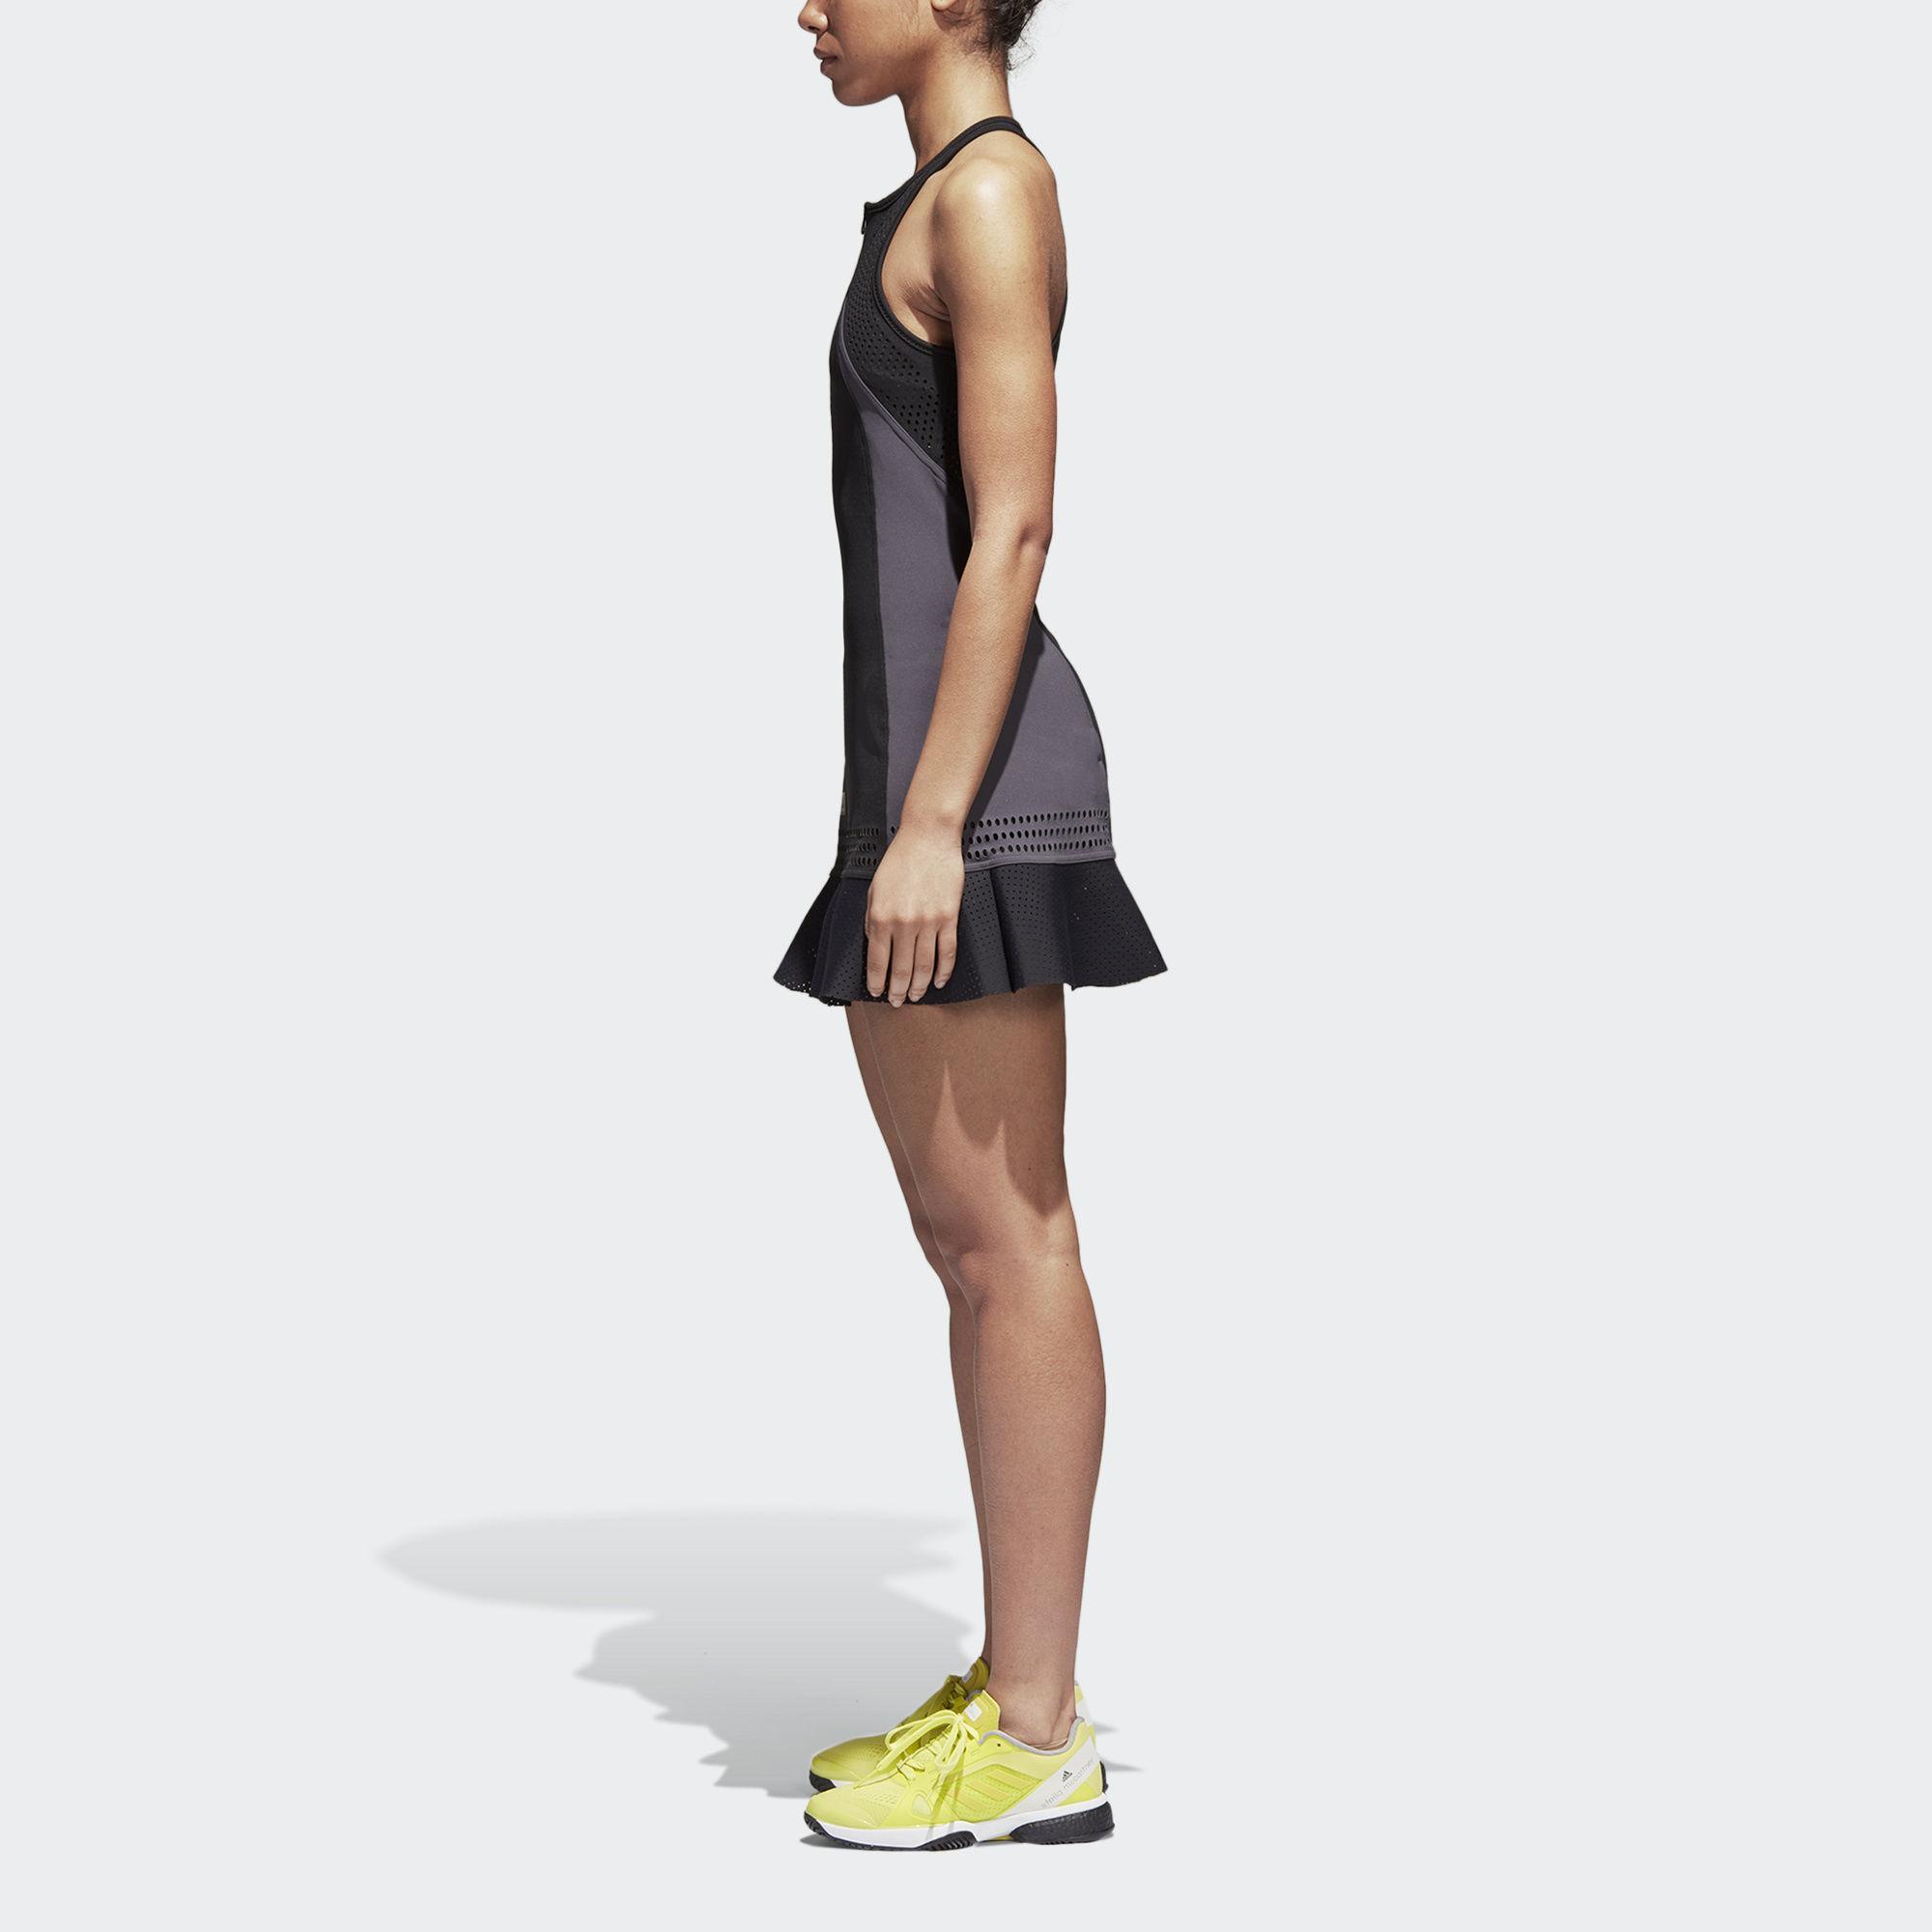 80e8bd3d26fb5 Adidas Womens Stella McCartney Barricade Dress - Black - Tennisnuts.com